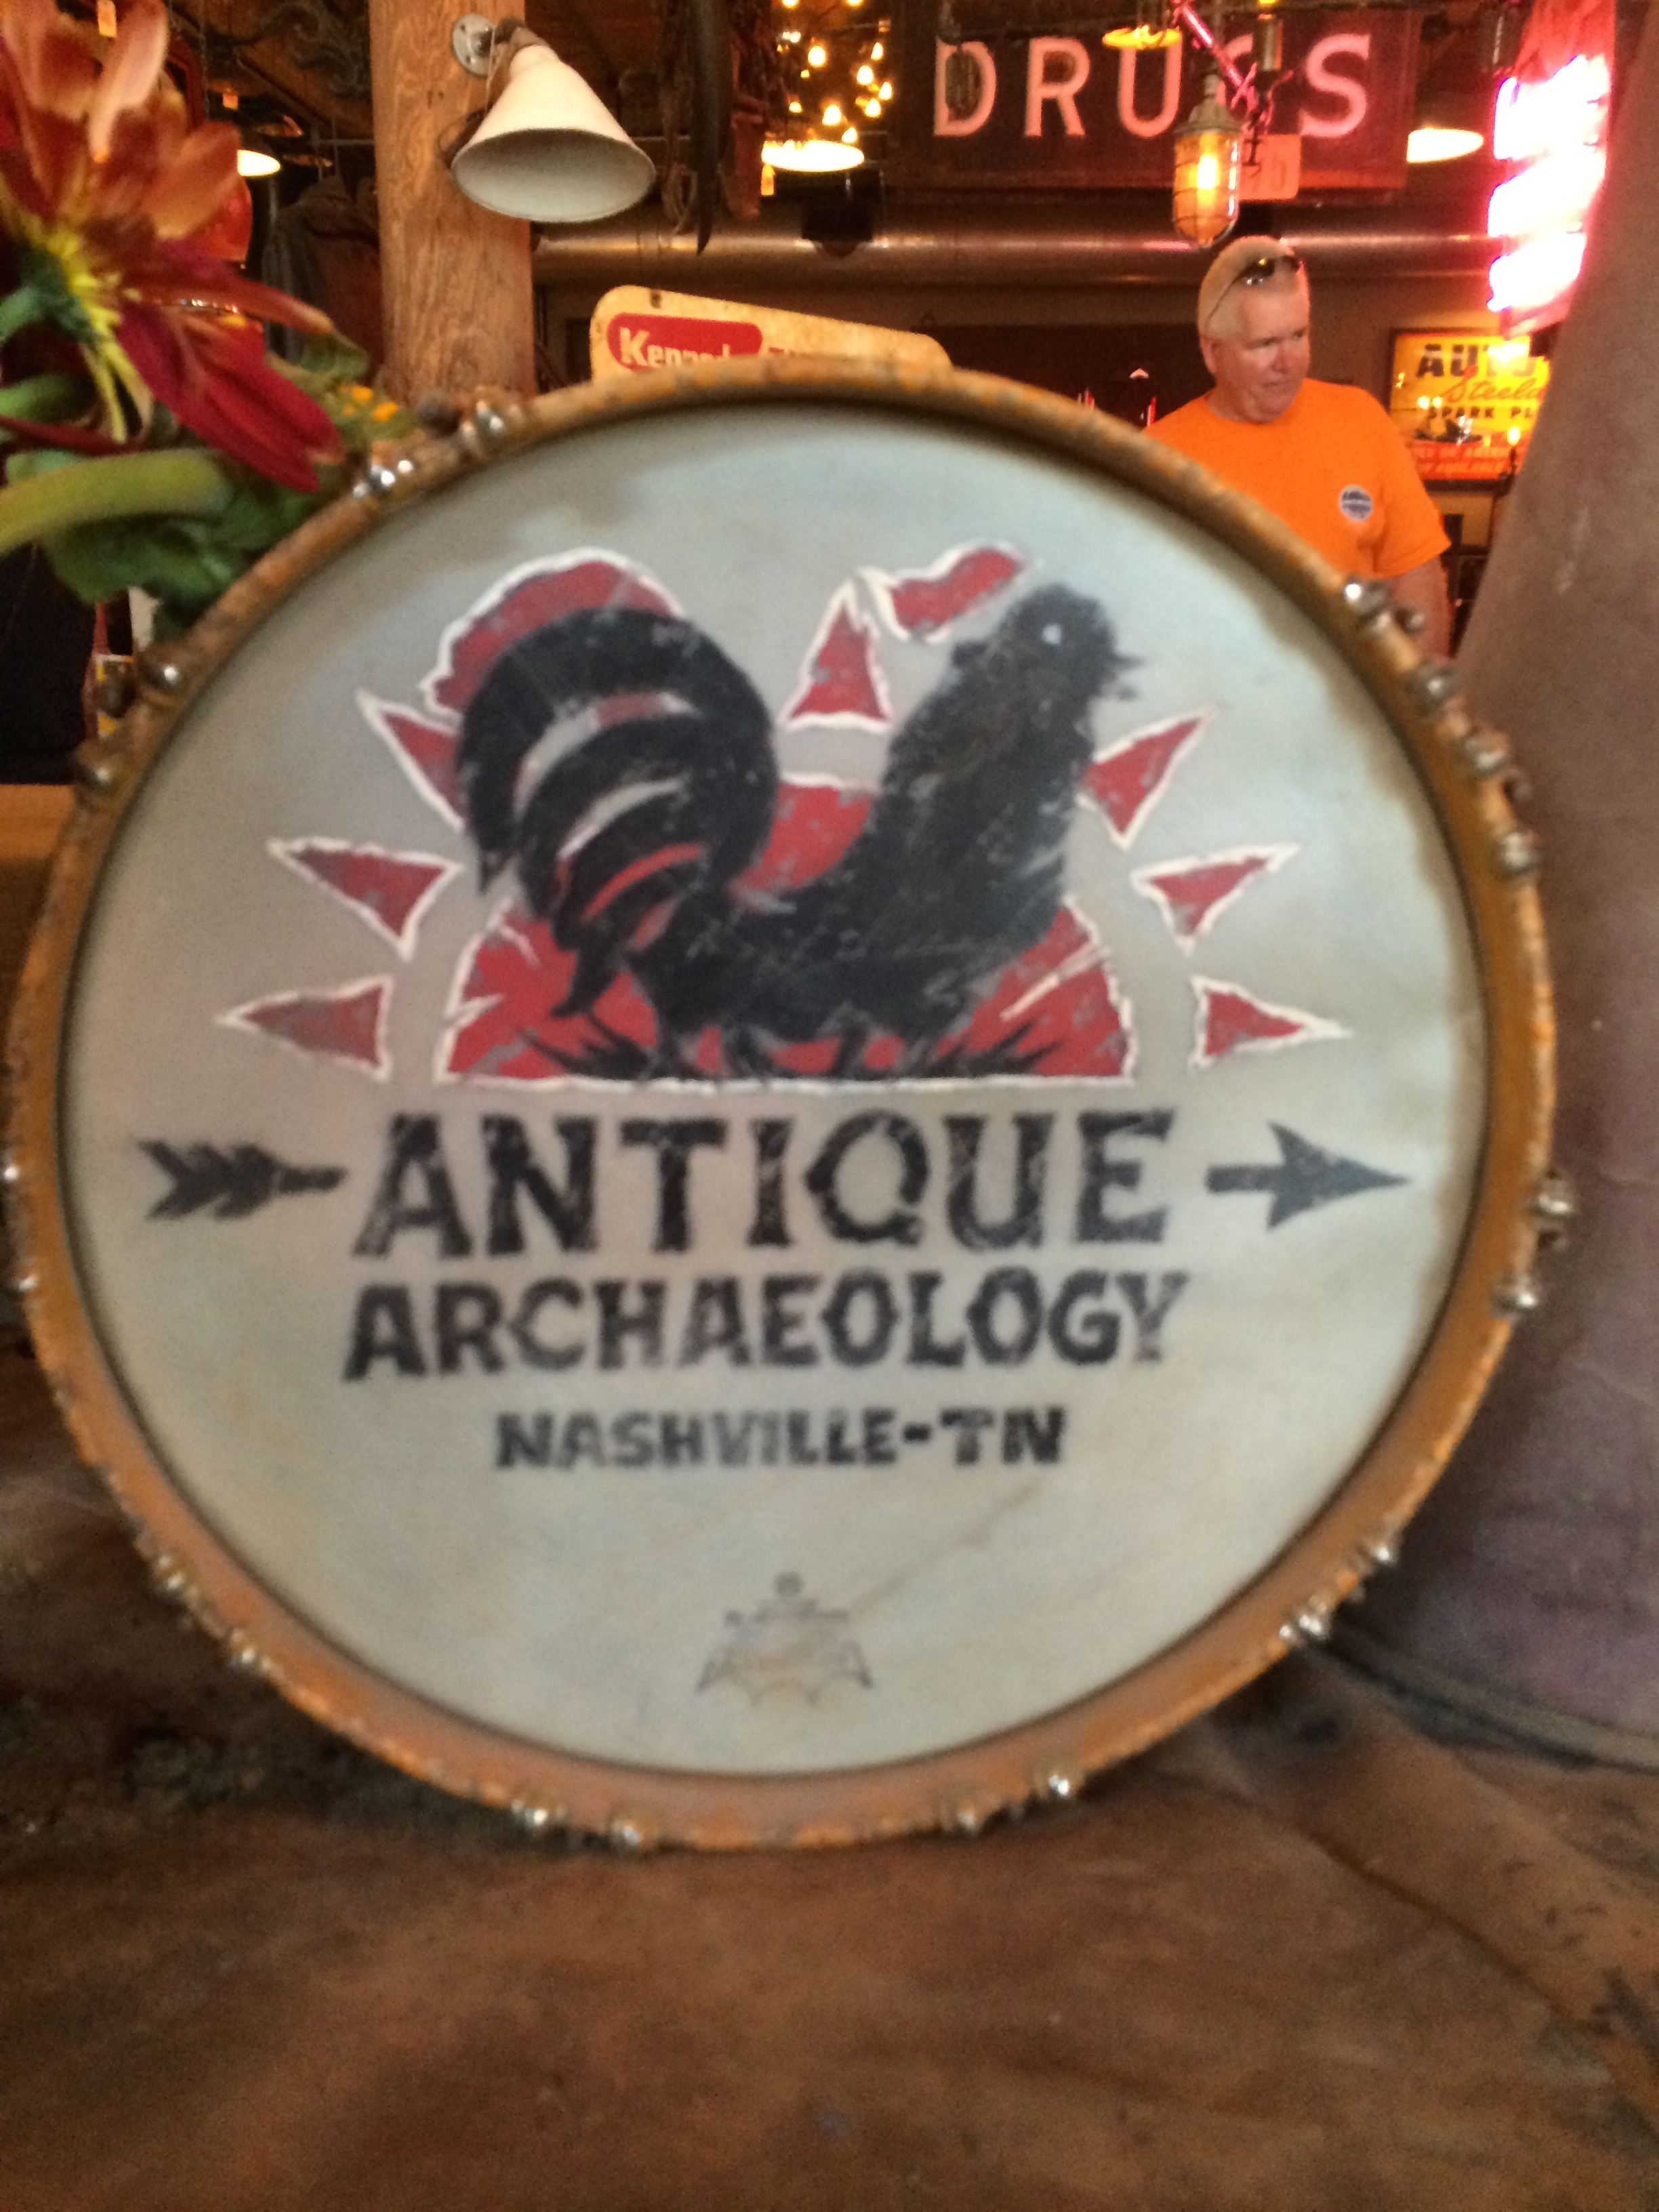 Antique Archeology in Nashville!